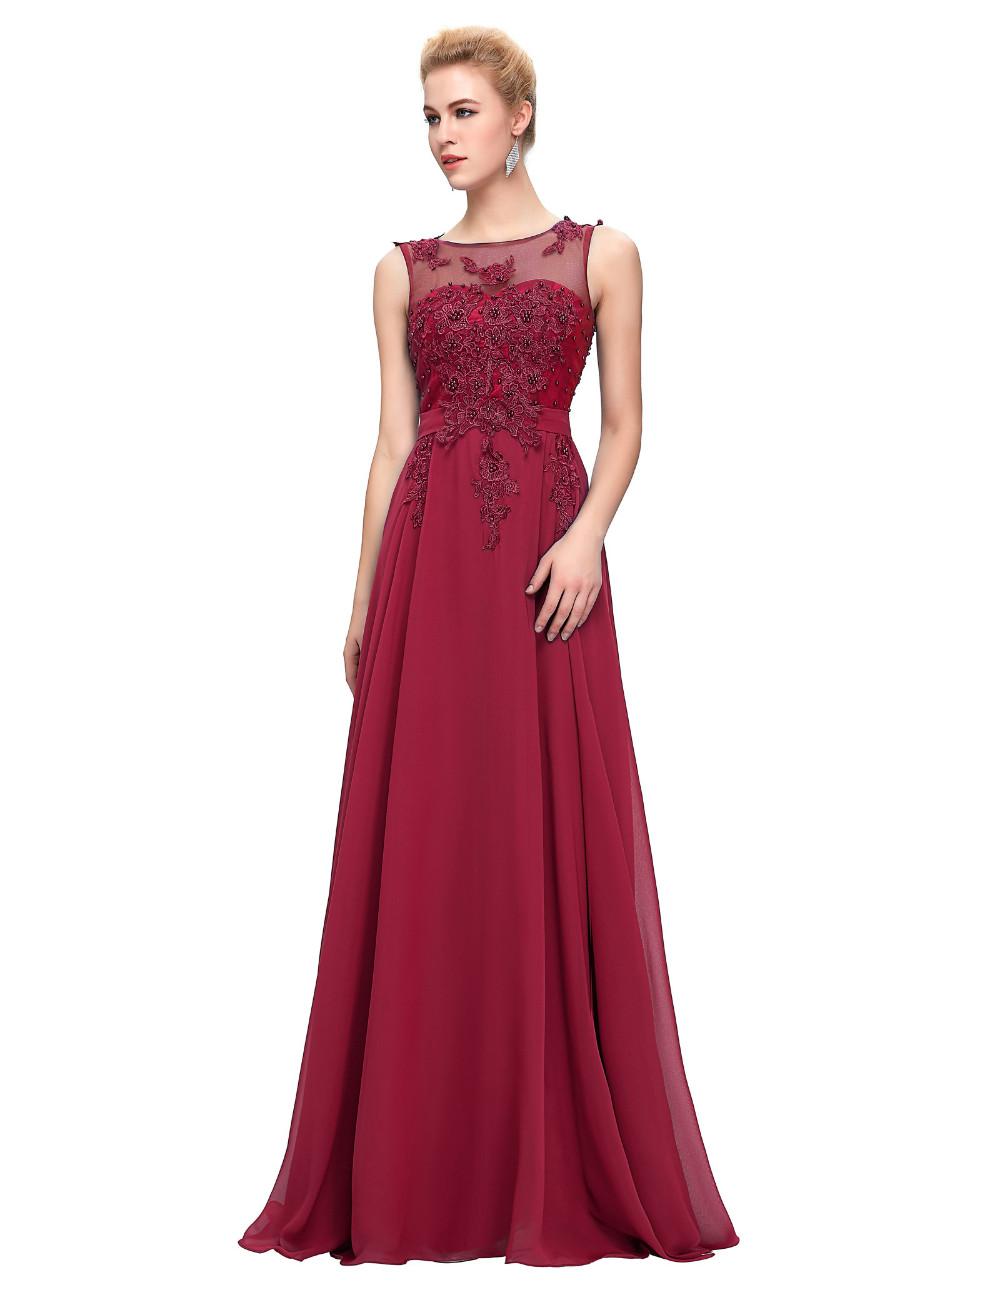 Grace Karin Elegant Long Evening Dresses 2016 Chiffon Pink Purple Red Royal Blue Black Formal Evening Dress Gown Abendkleider 52